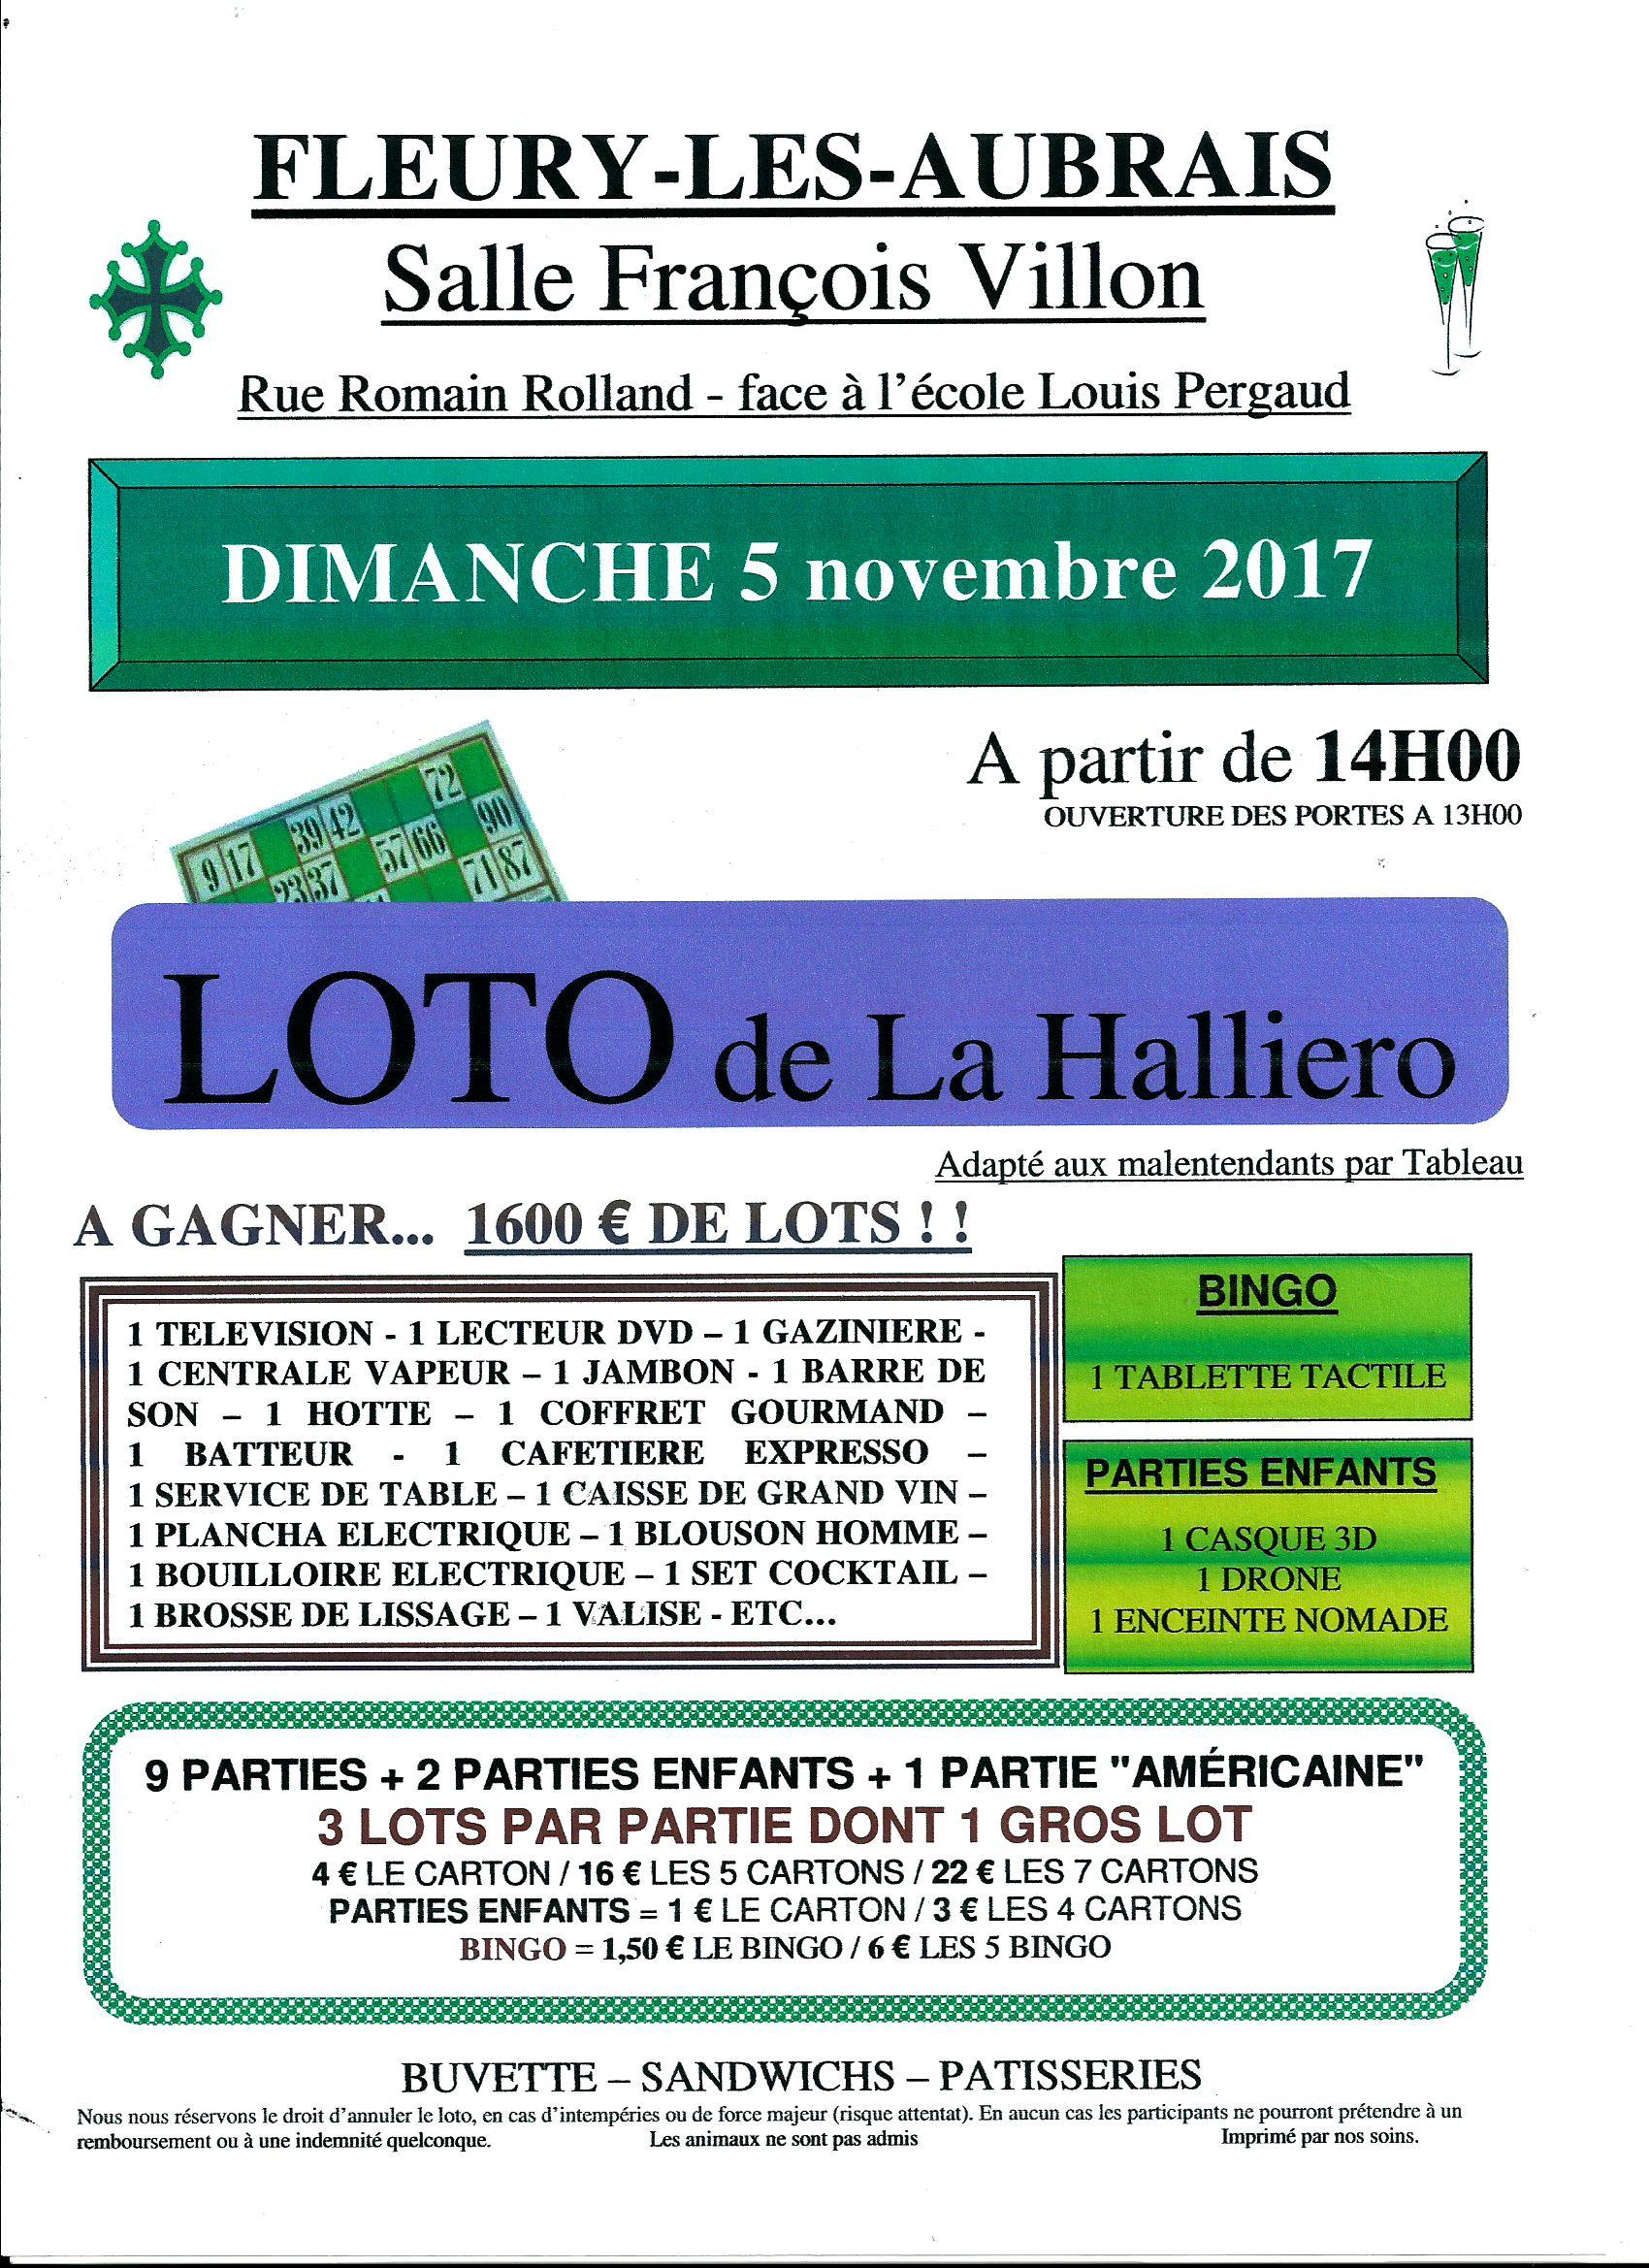 Scan Affiche Loto de La Halliero 2017 (05.11.2017).jpg